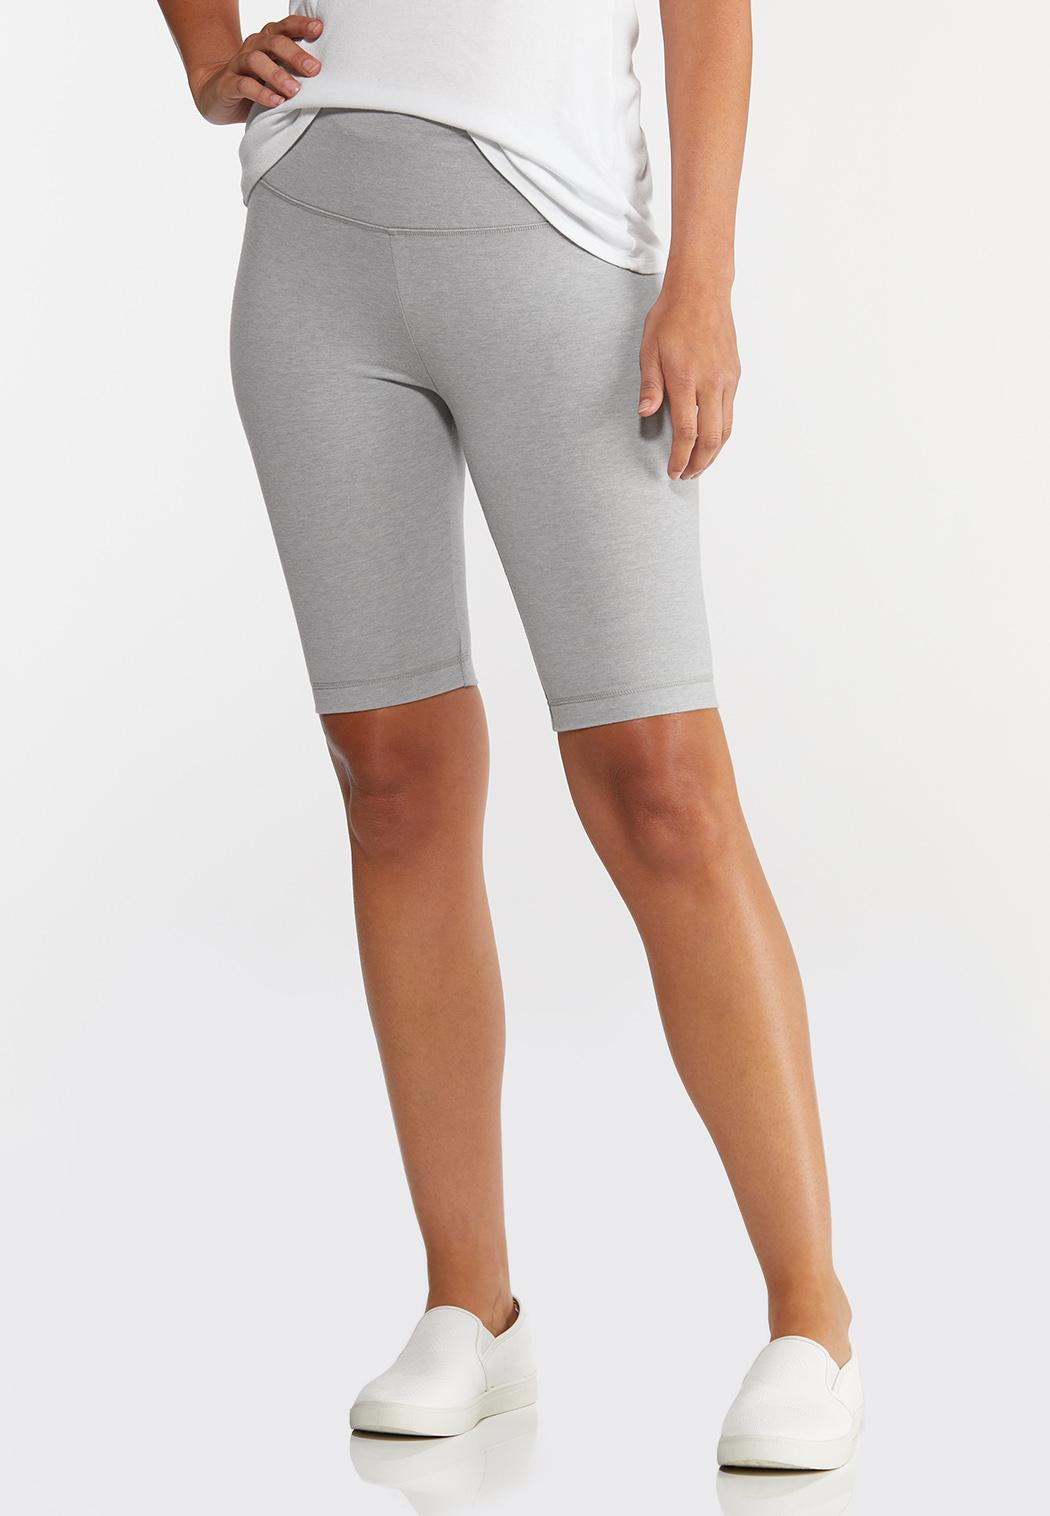 Pull-On Stretch Biker Shorts